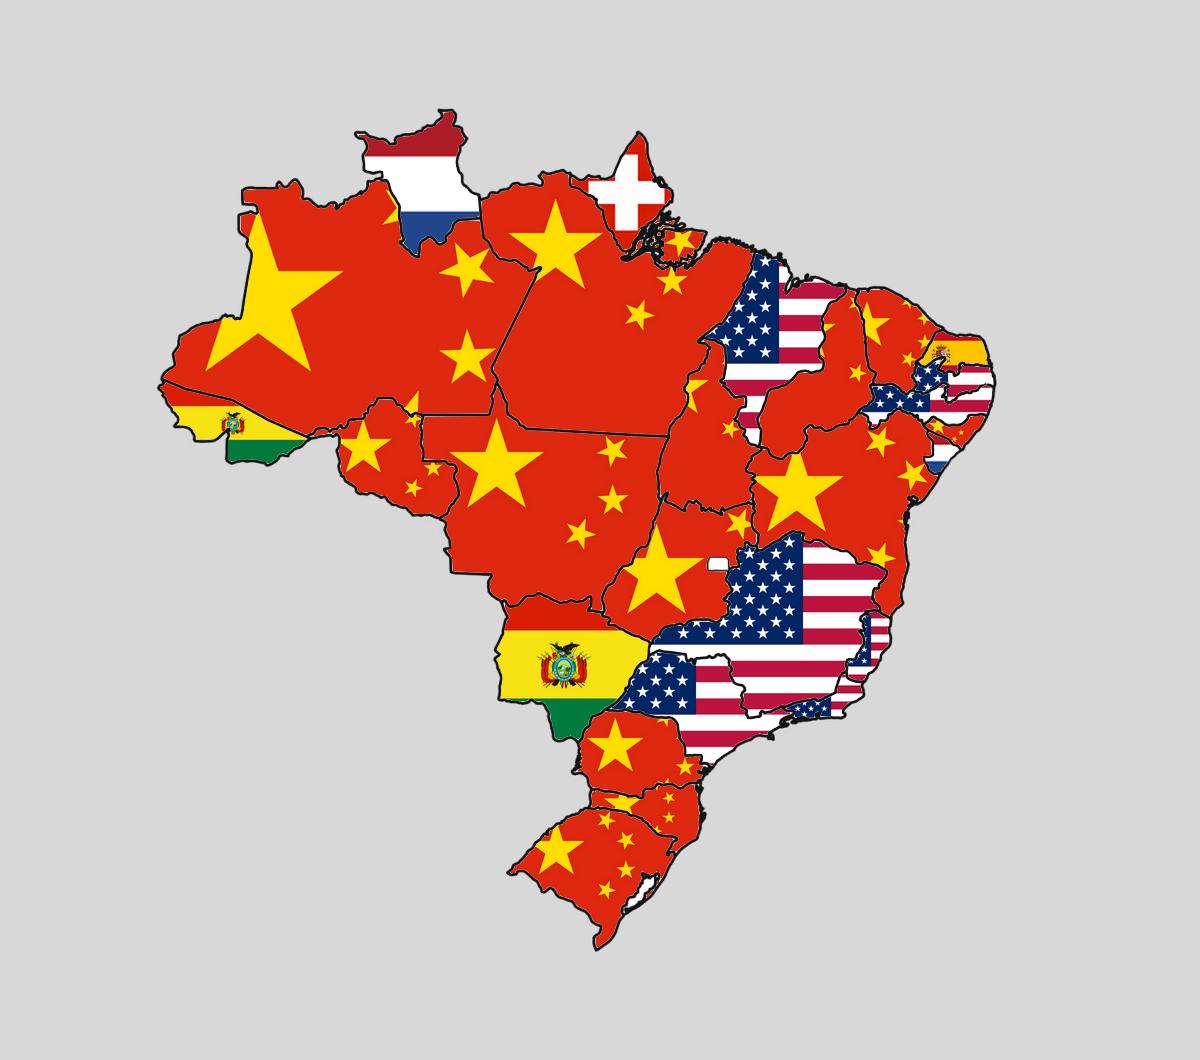 O Maior Parceiro Comercial de Cada Estado Brasileiro